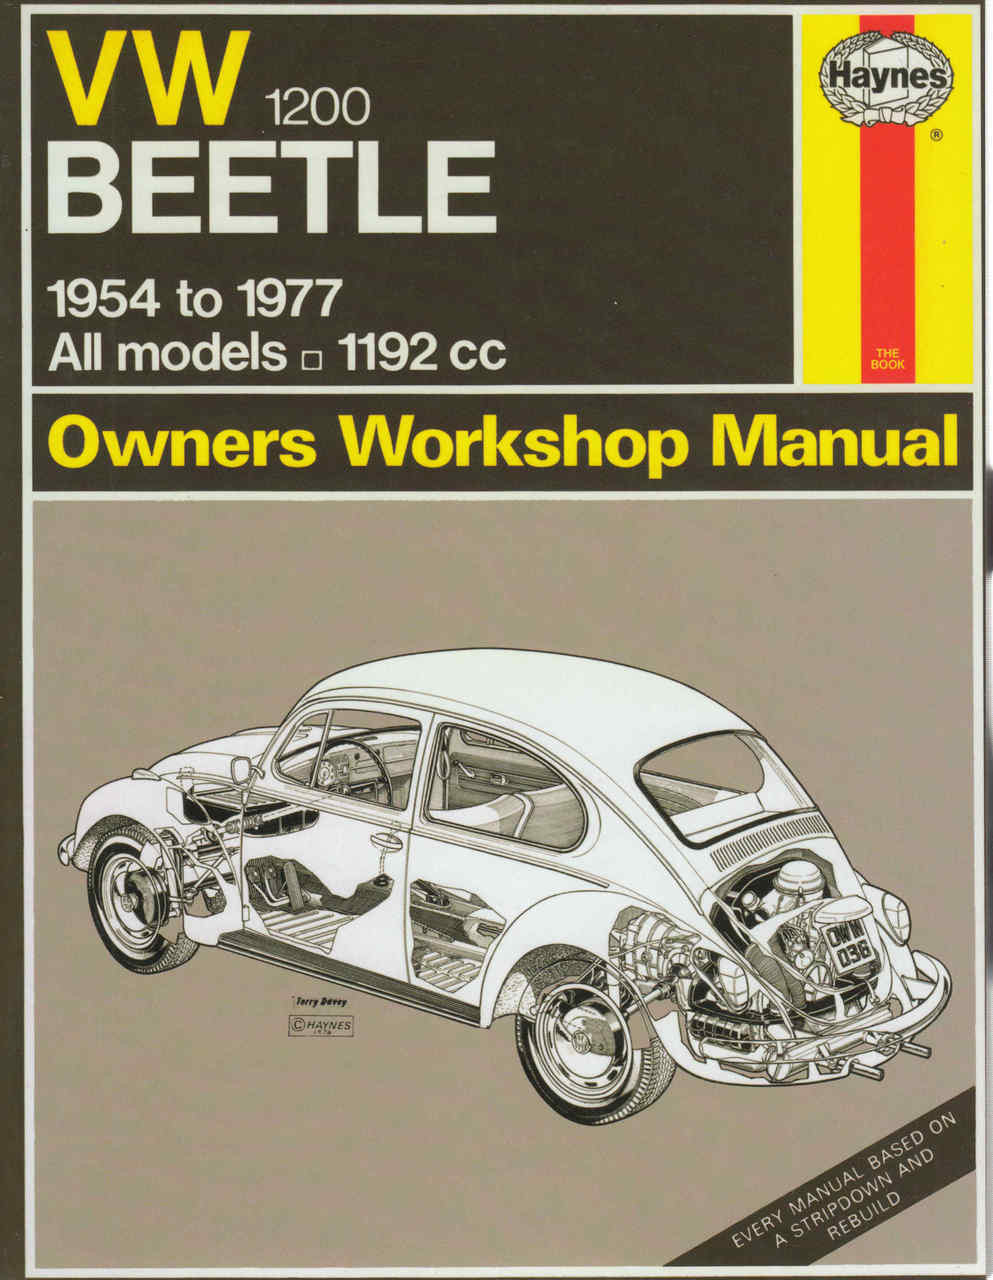 2000 Vw beetle Haynes Manual pdf key